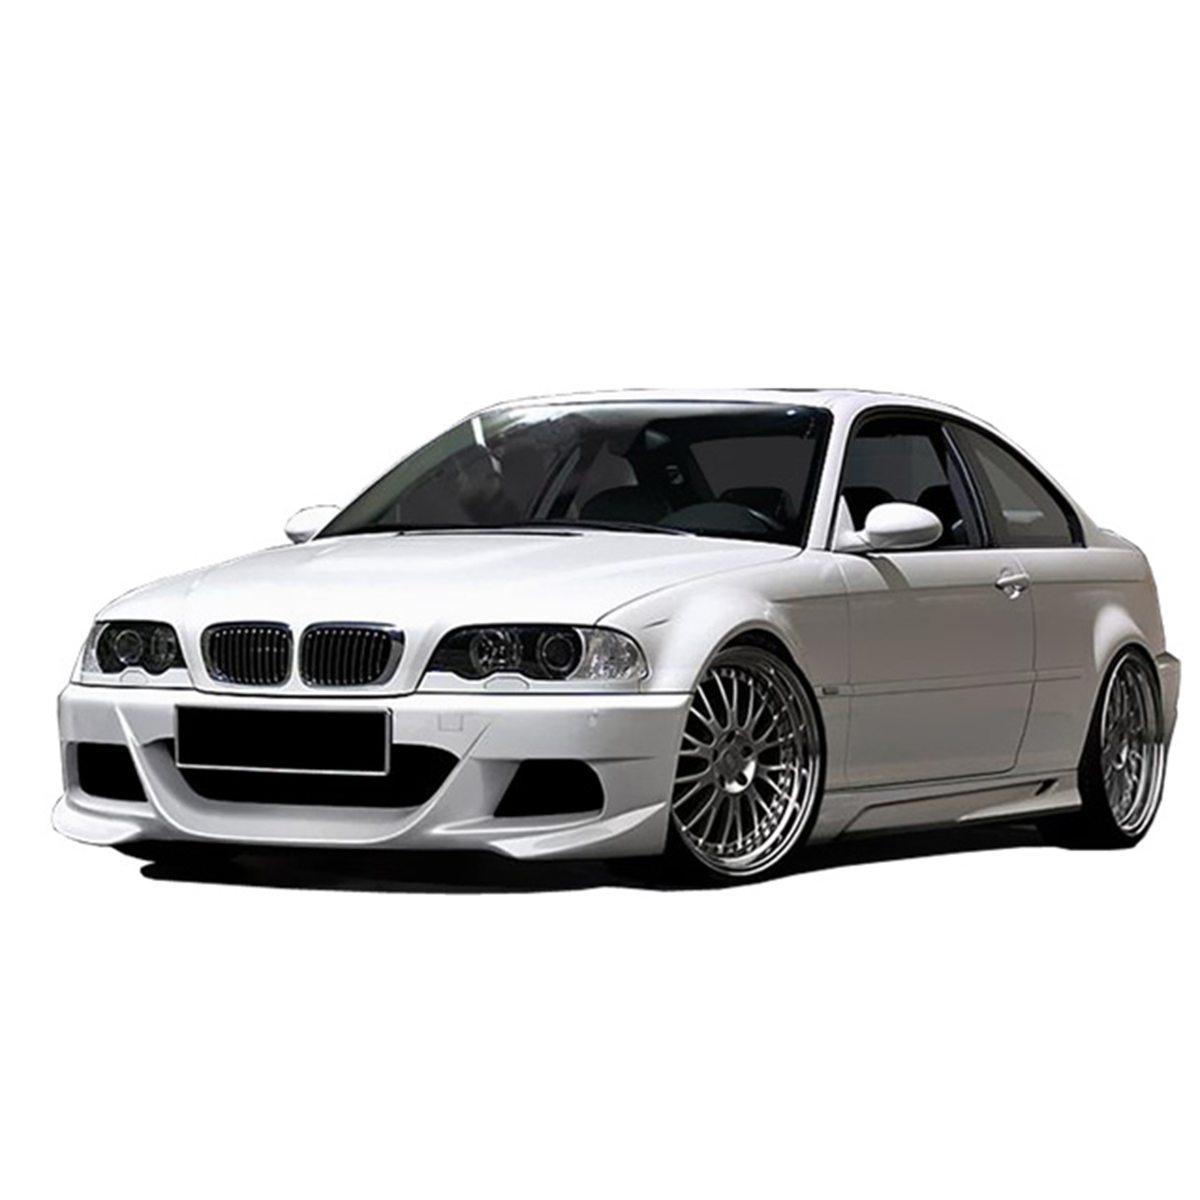 bmw serie 3 e46 cabrio 03 07 kit completo desportivo. Black Bedroom Furniture Sets. Home Design Ideas